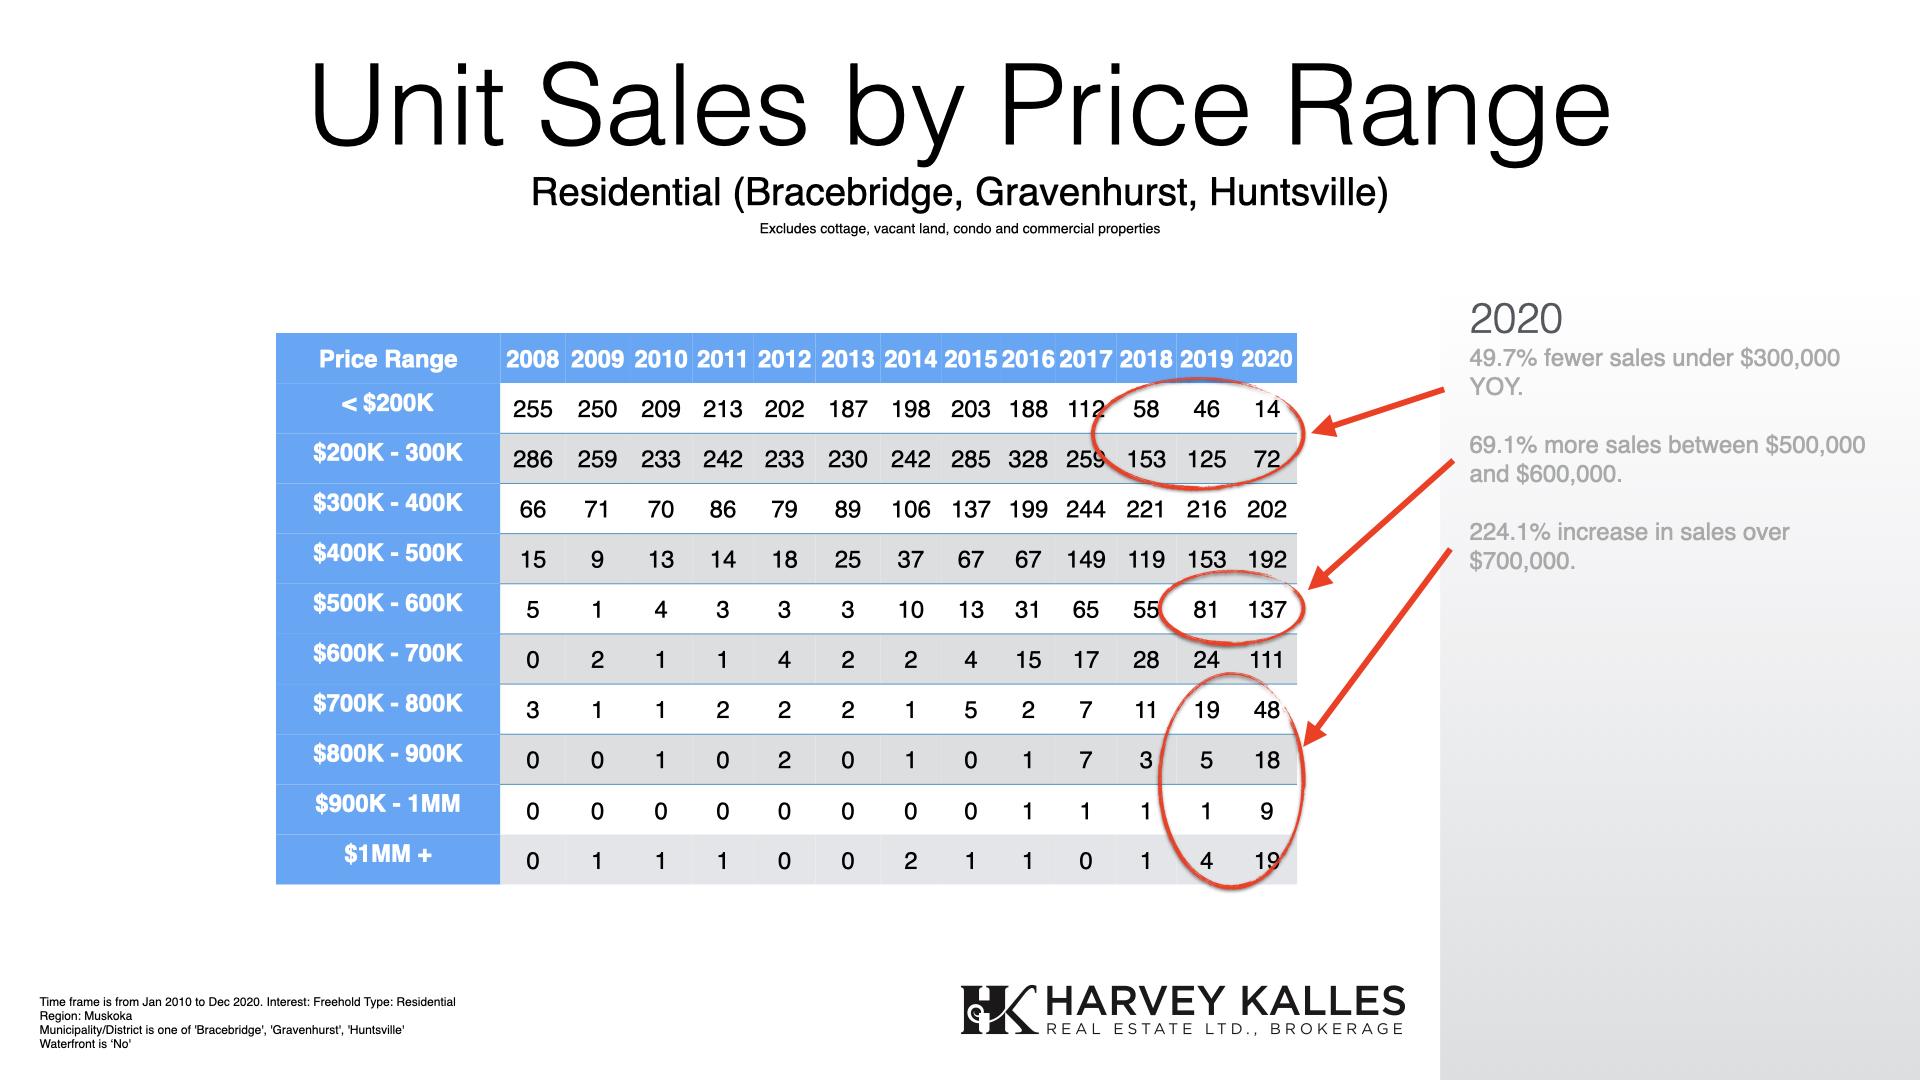 Muskoka Residential Real Estate Unit Sales By Price Range